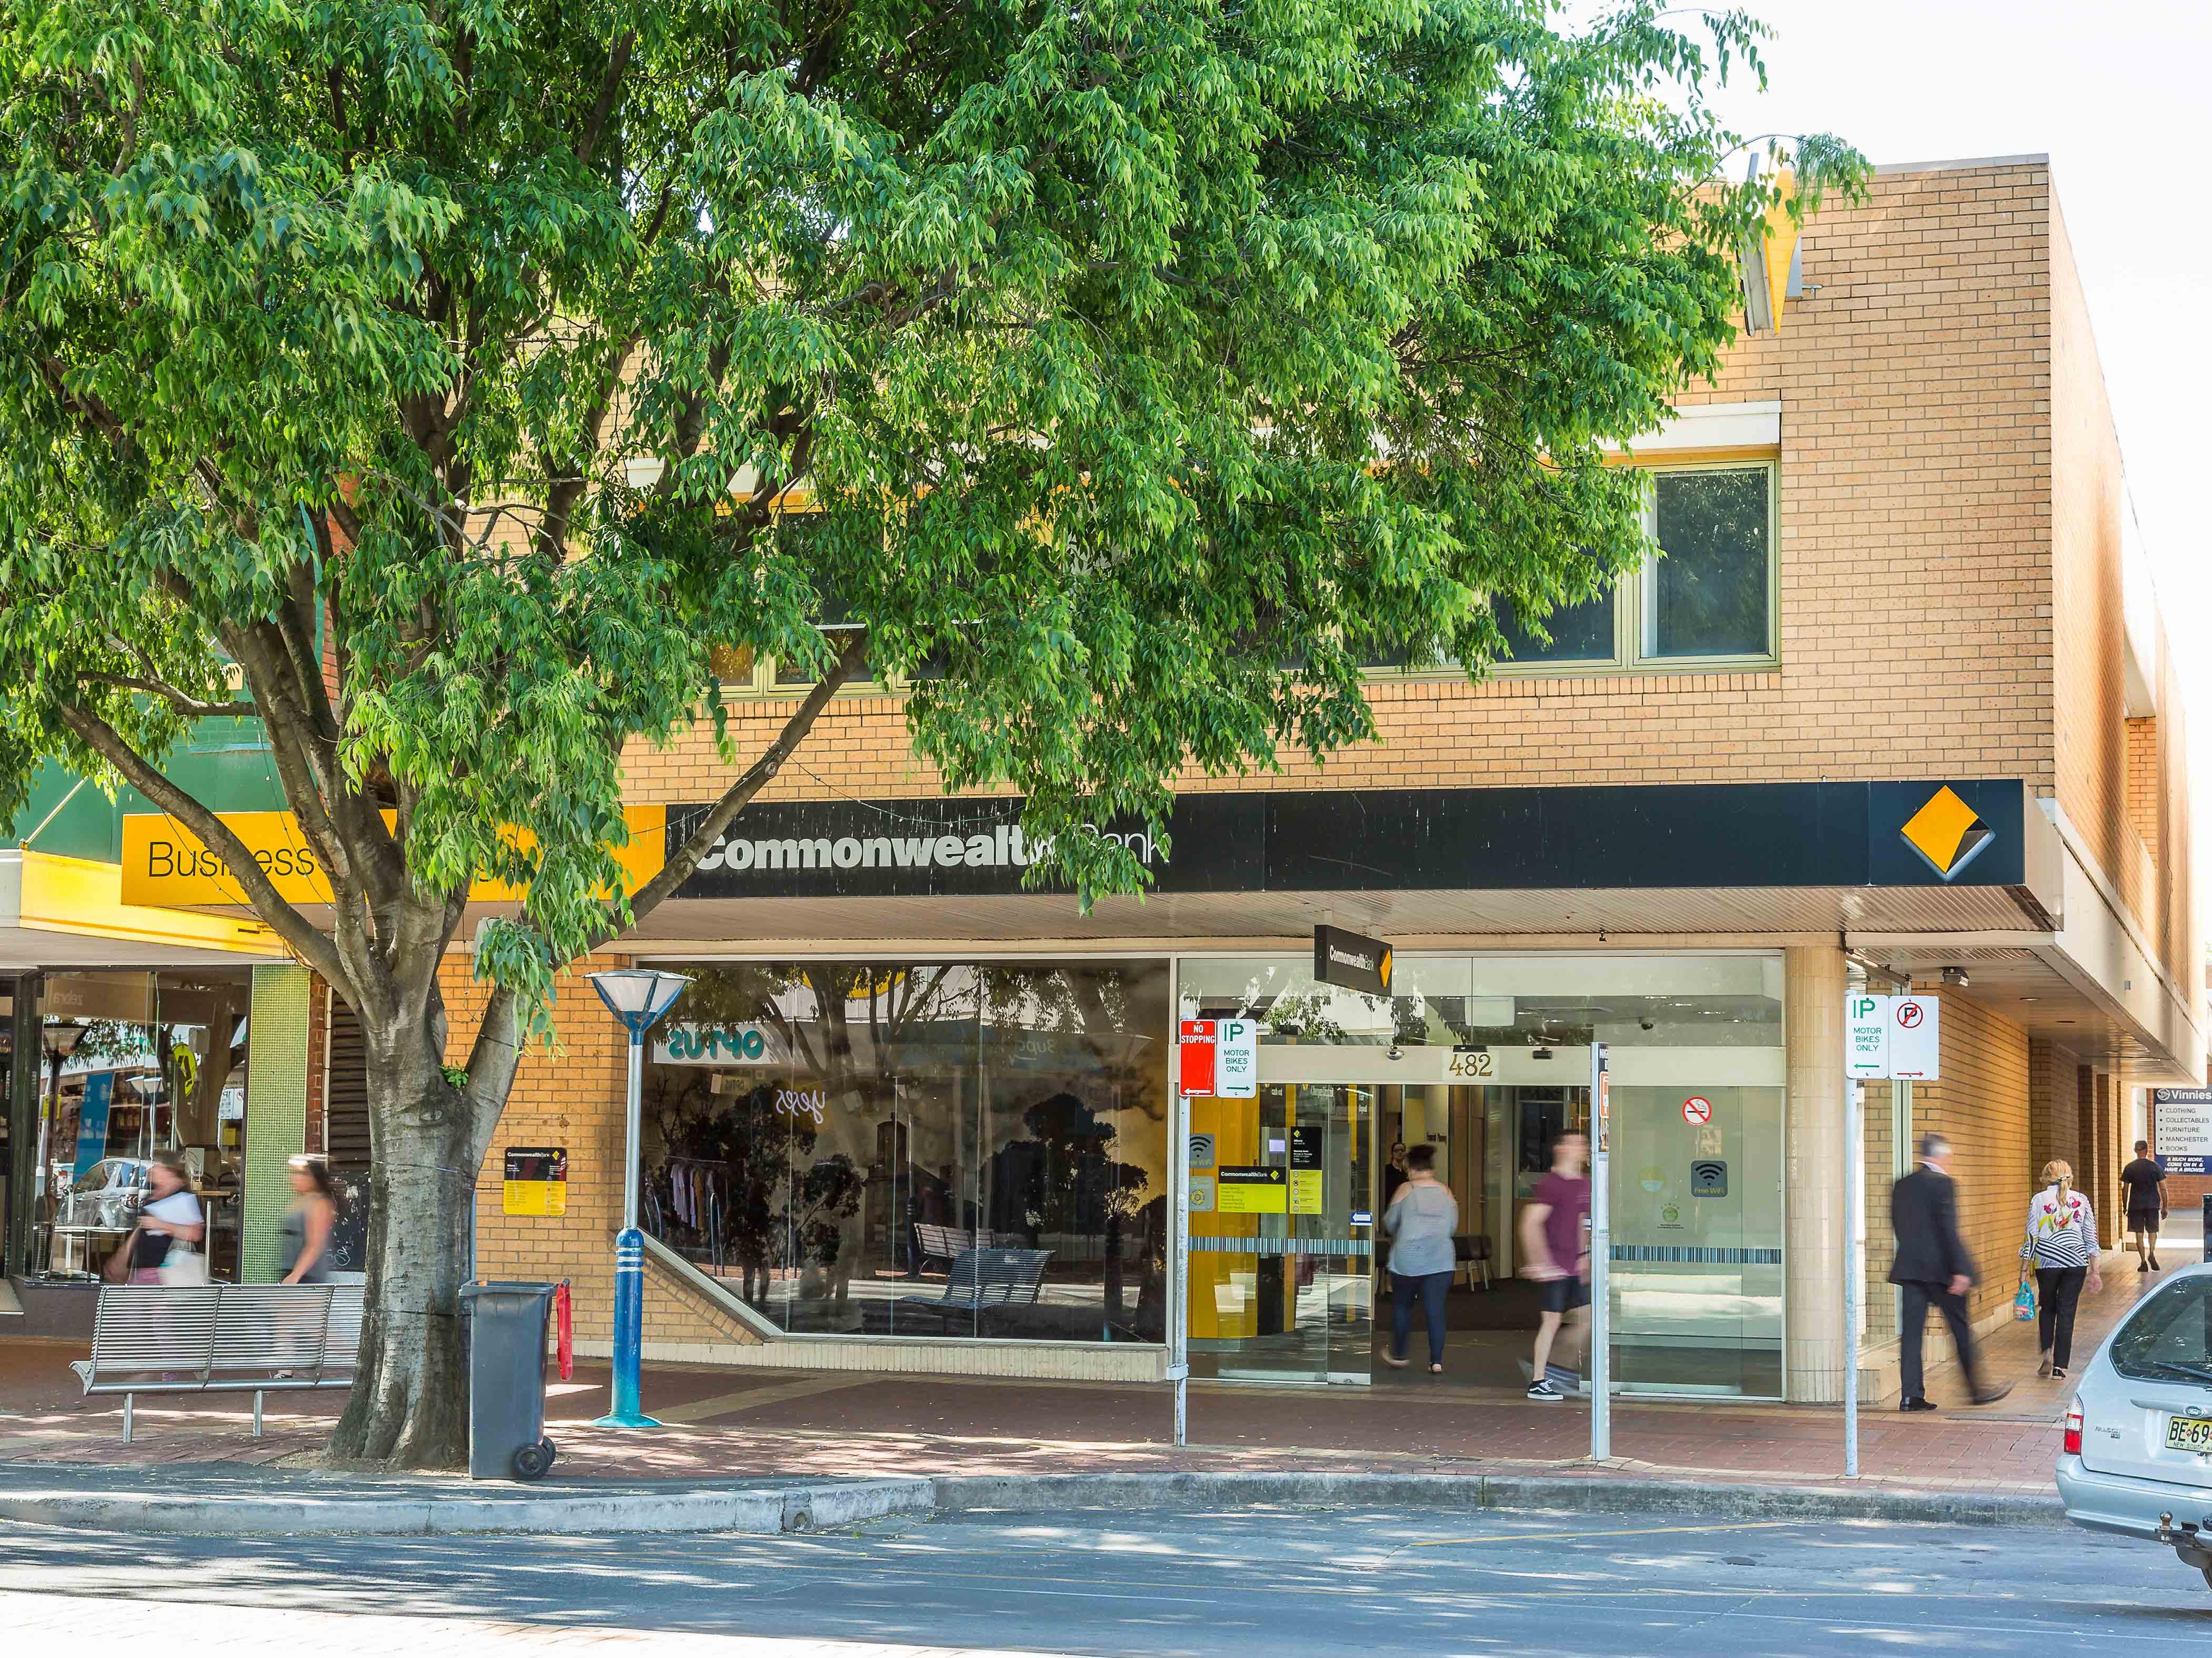 Long Established Commonwealth Bank Branch